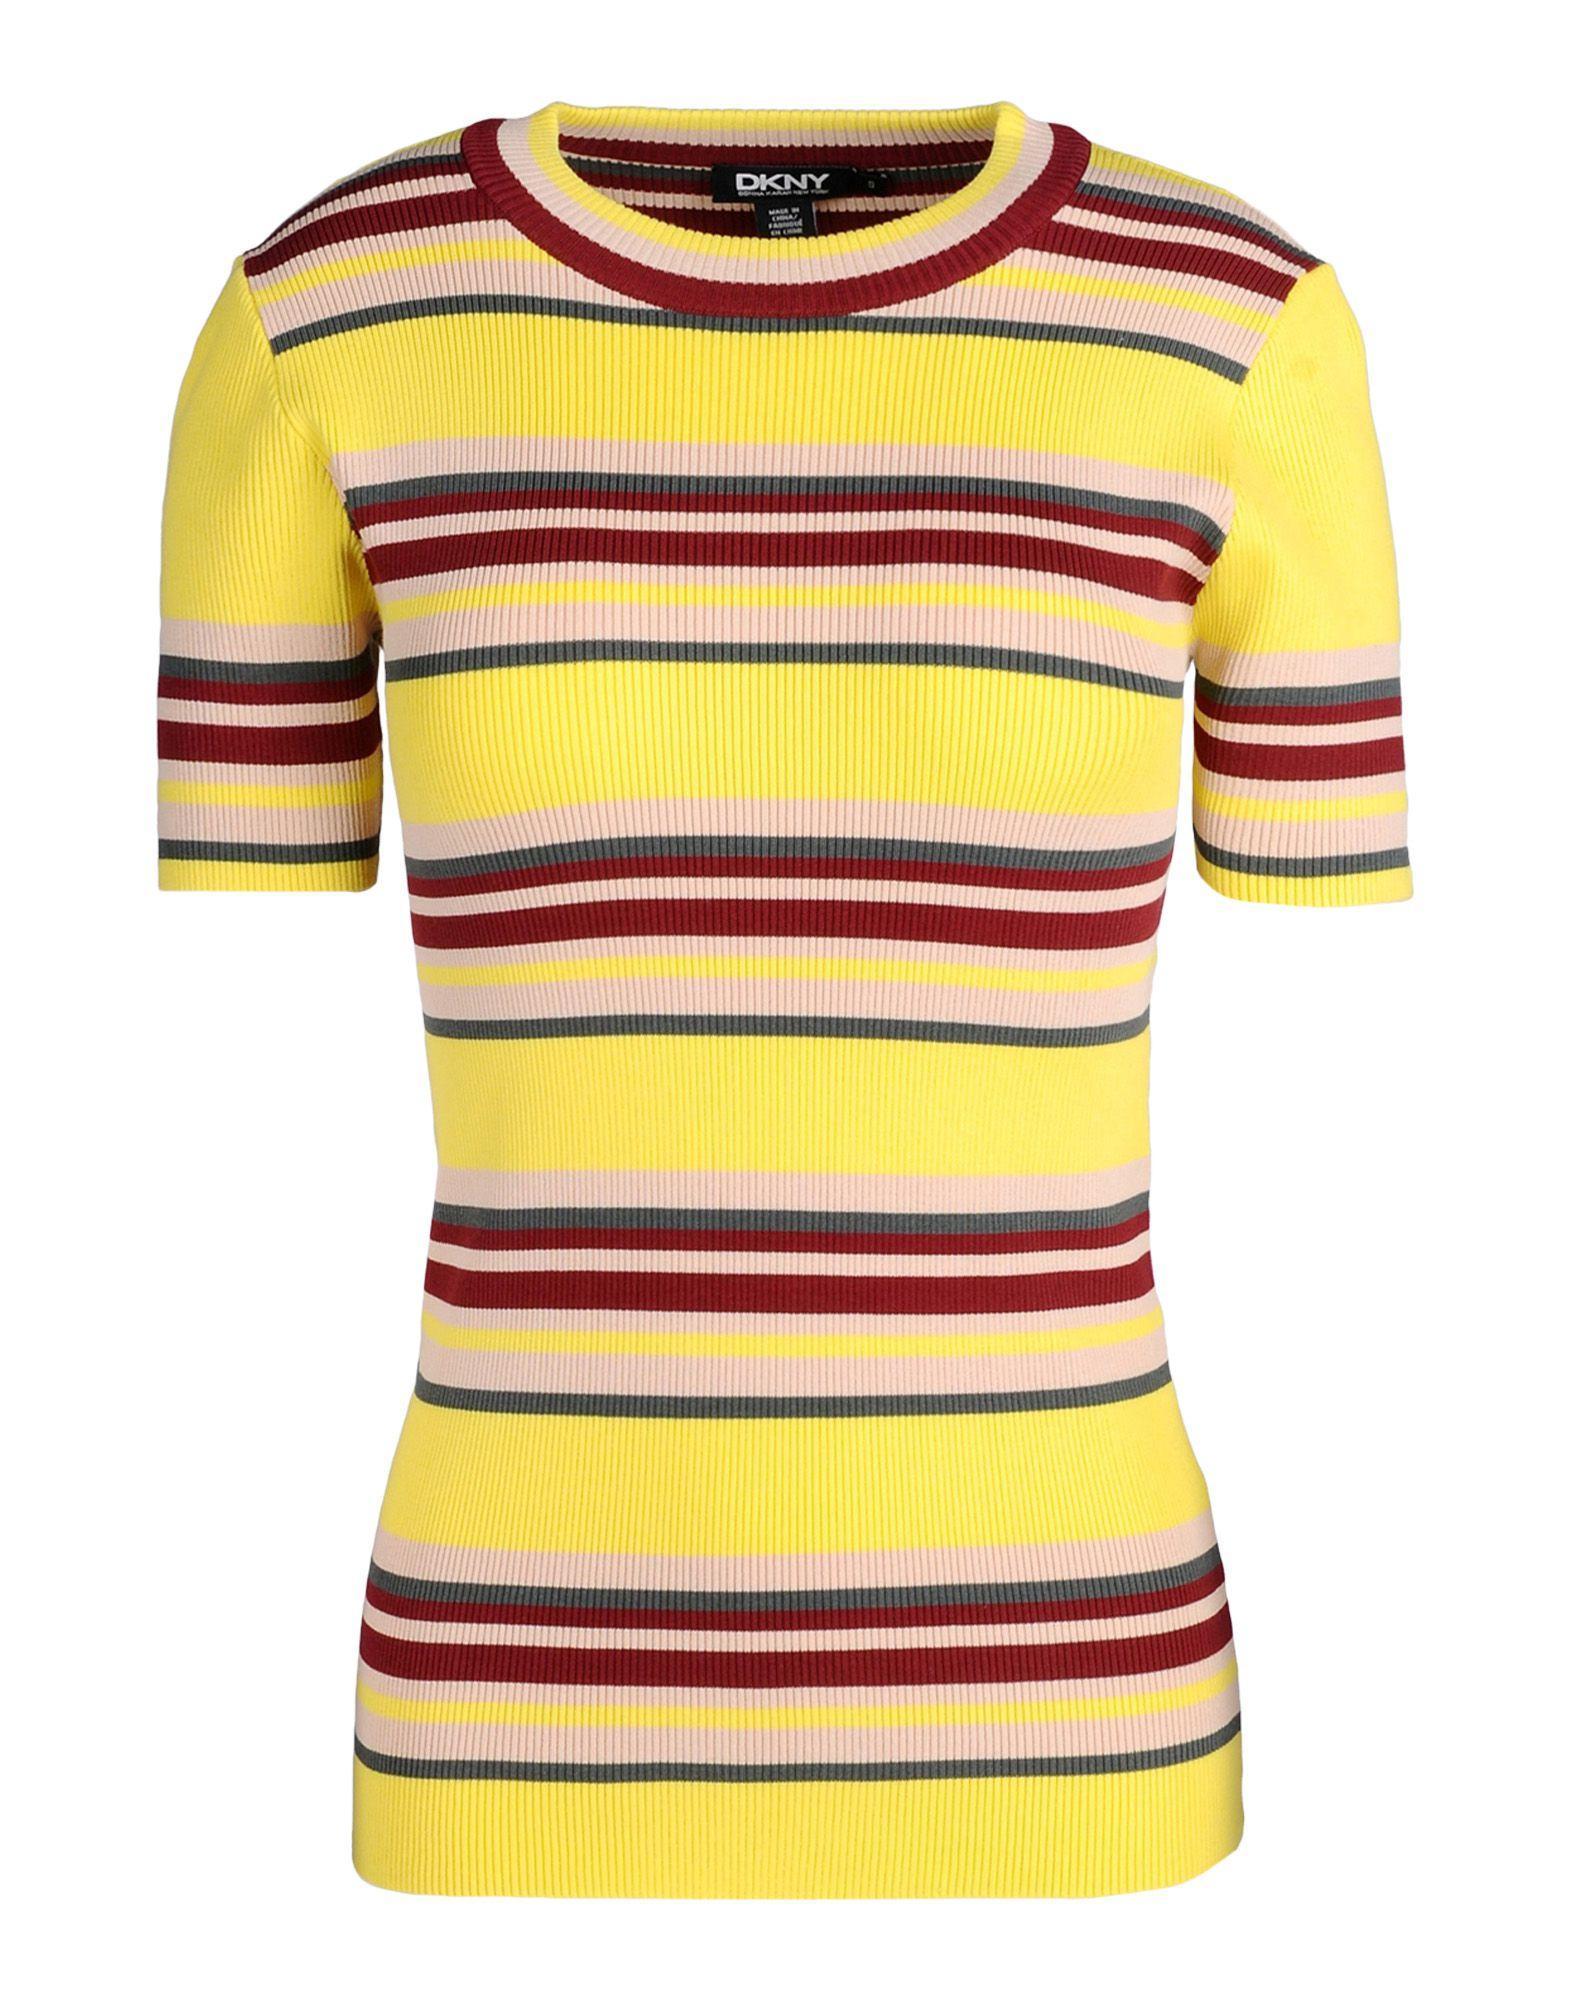 Yellow Short Sleeve Sweater - Cashmere Sweater England